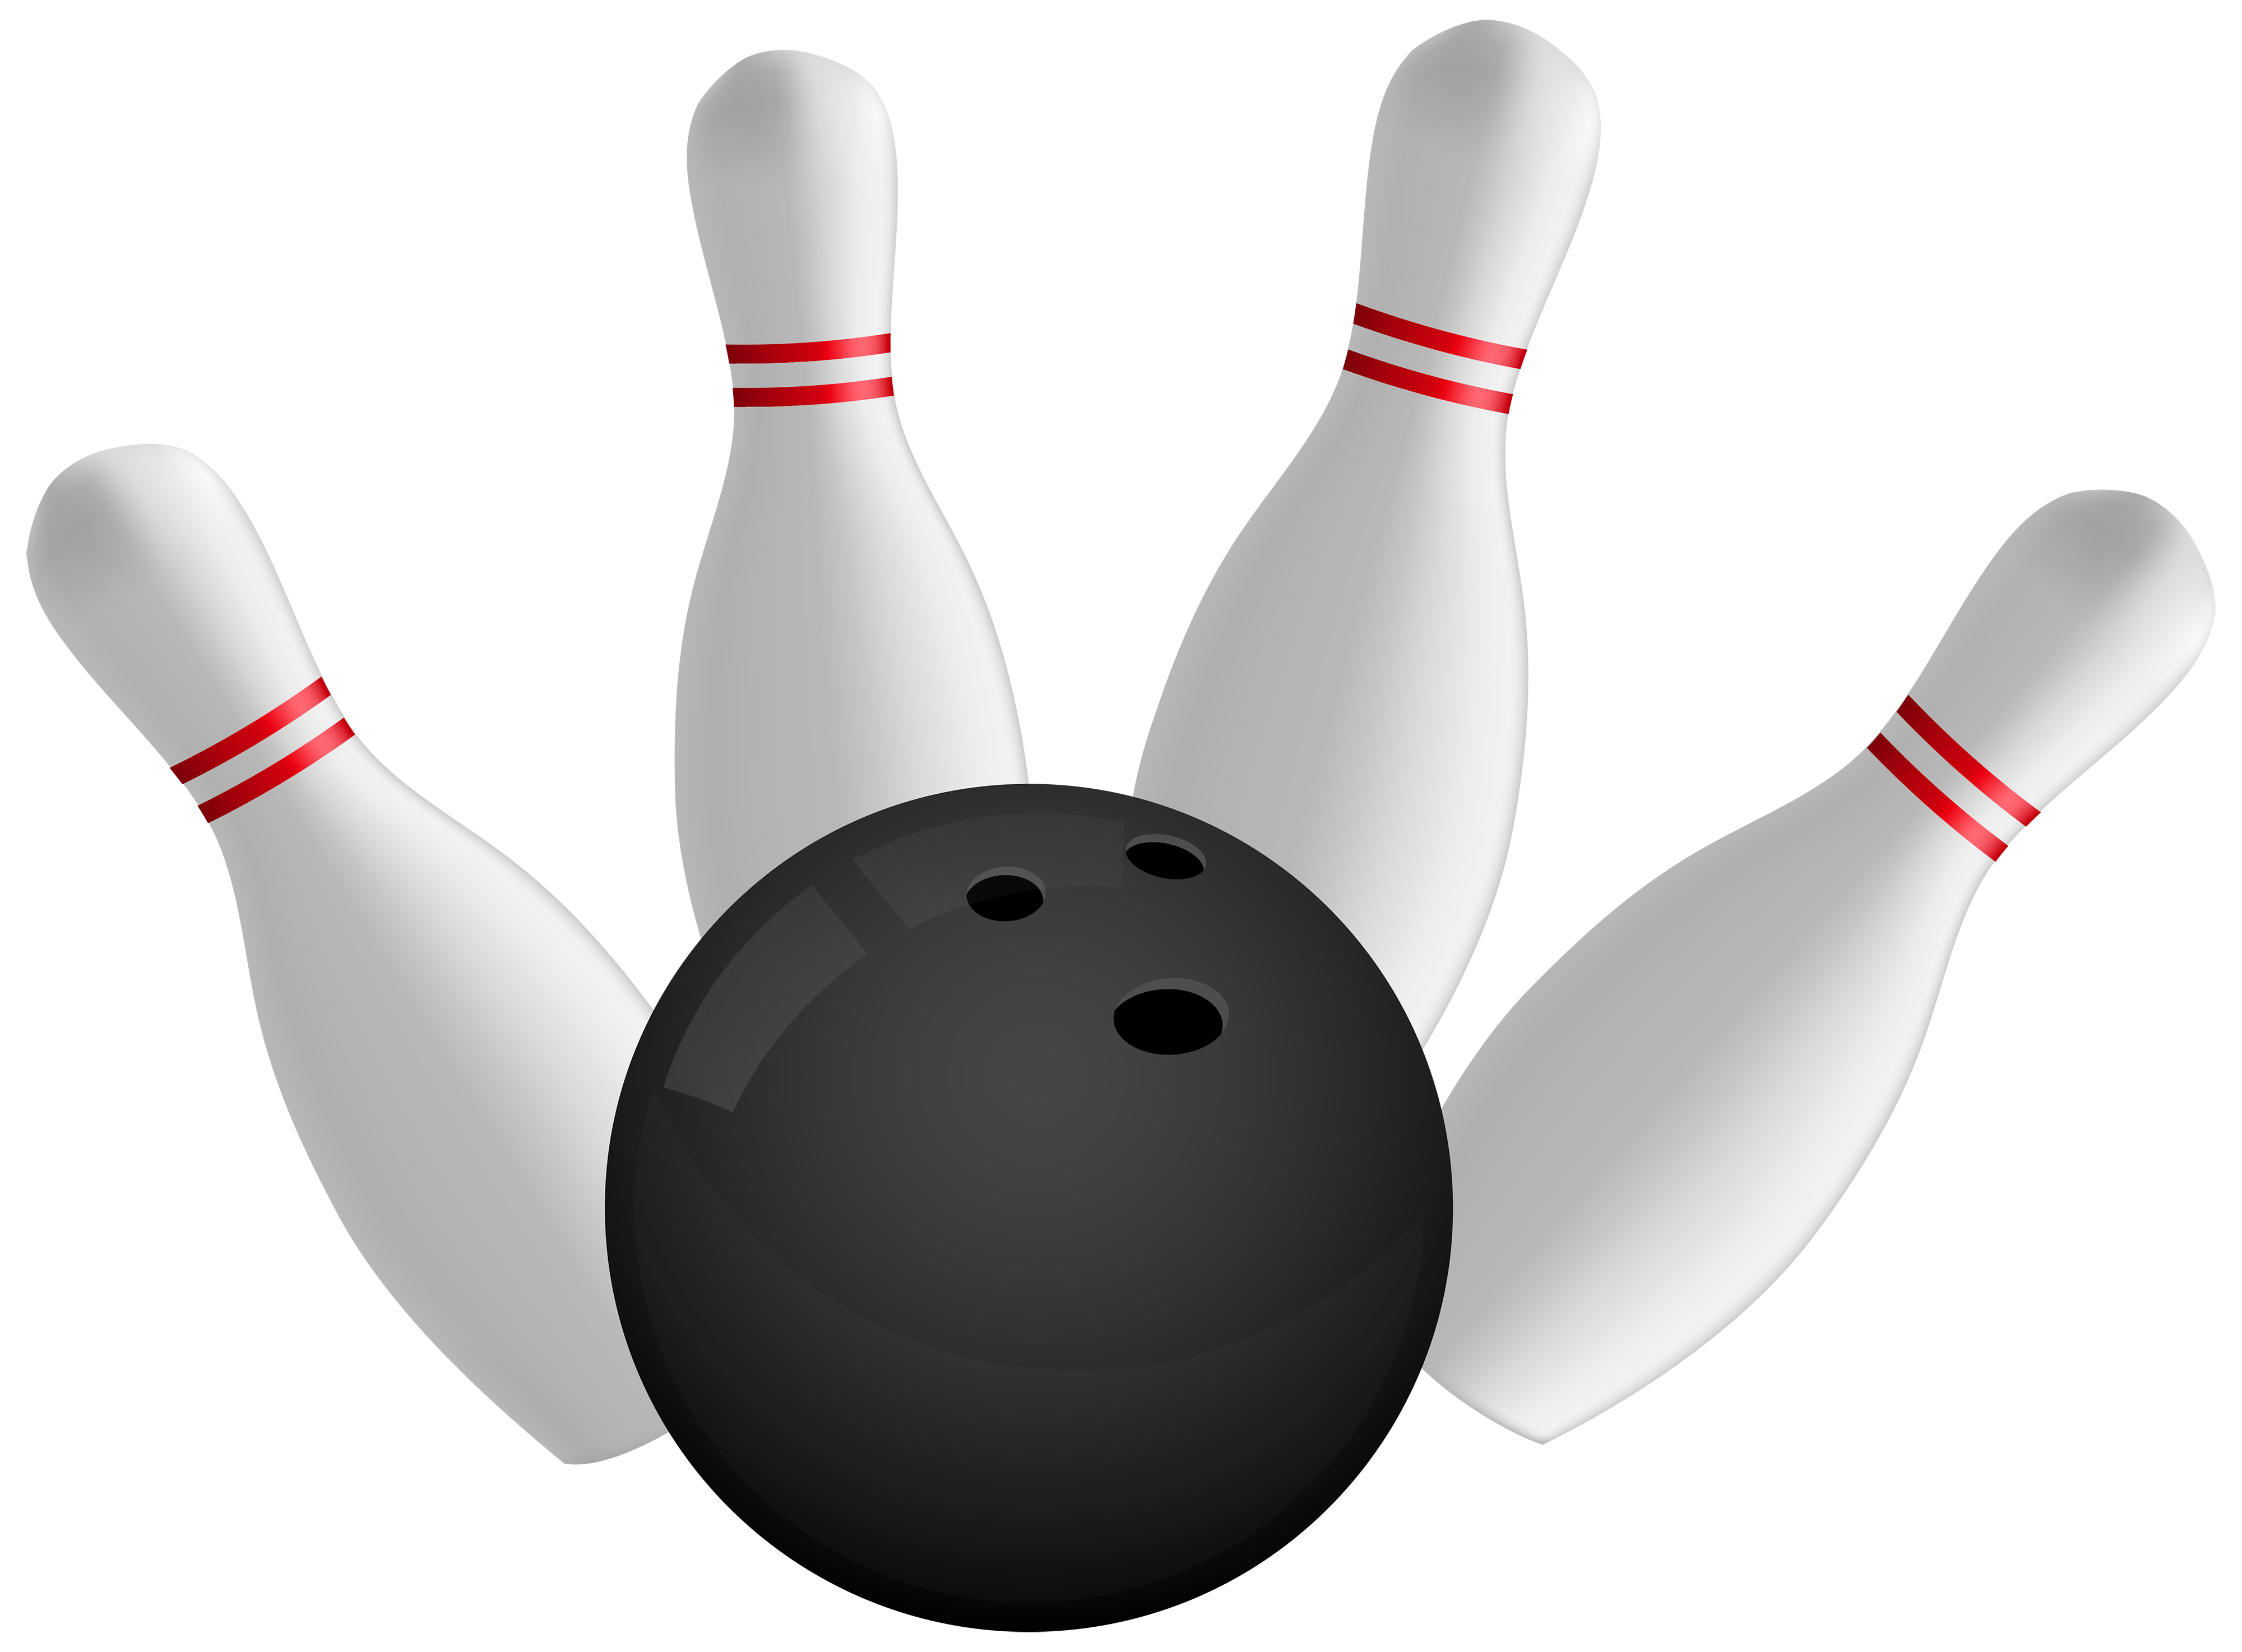 Bowling clipart transparent background svg transparent Bowling Ball and Pins PNG Clipart - Best WEB Clipart svg transparent